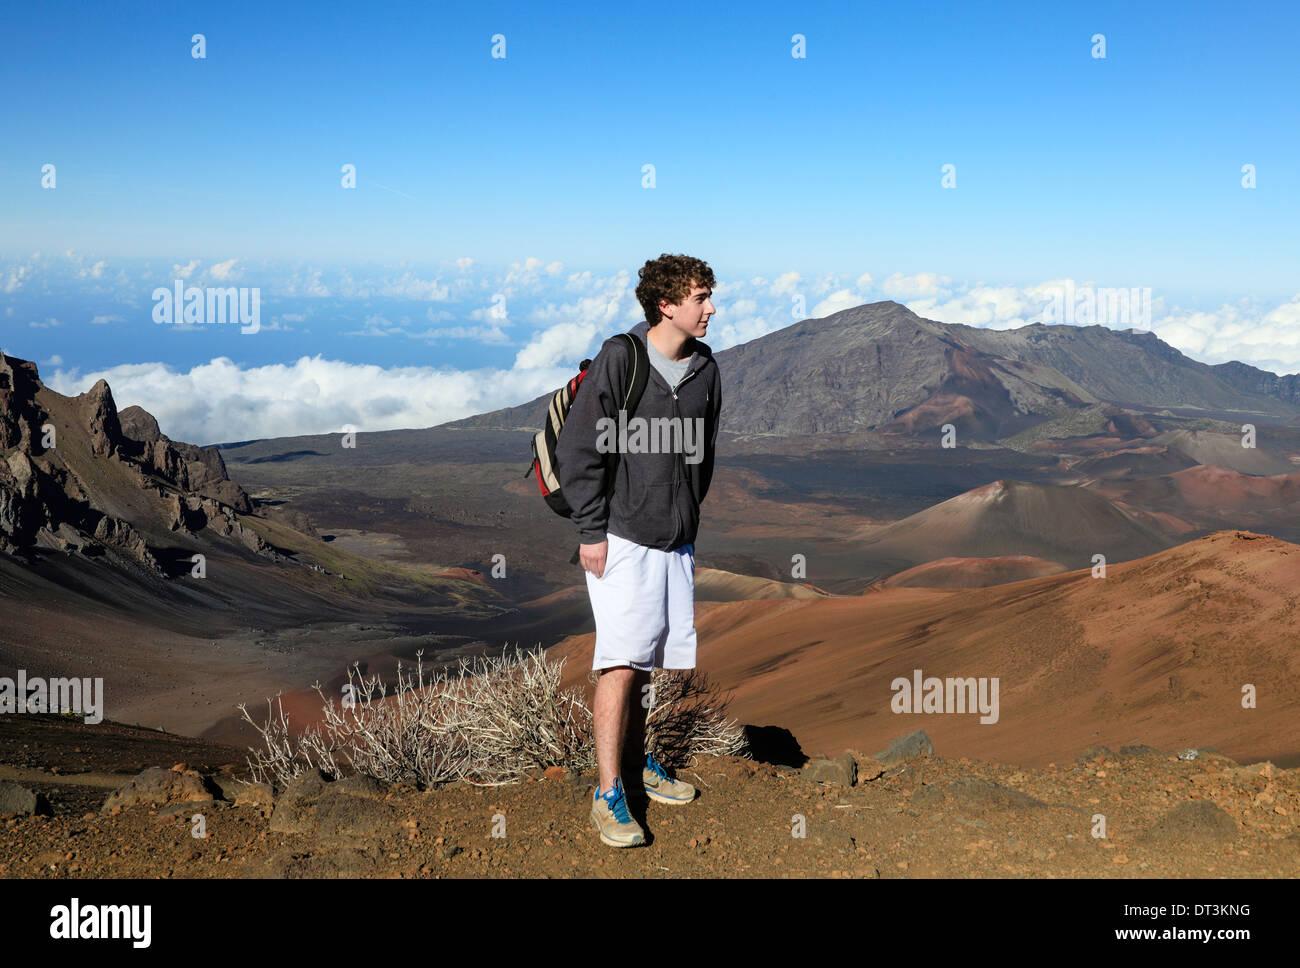 Hiker on the Sliding Sands Trail gazes at Haleakala National Park on Maui - Stock Image